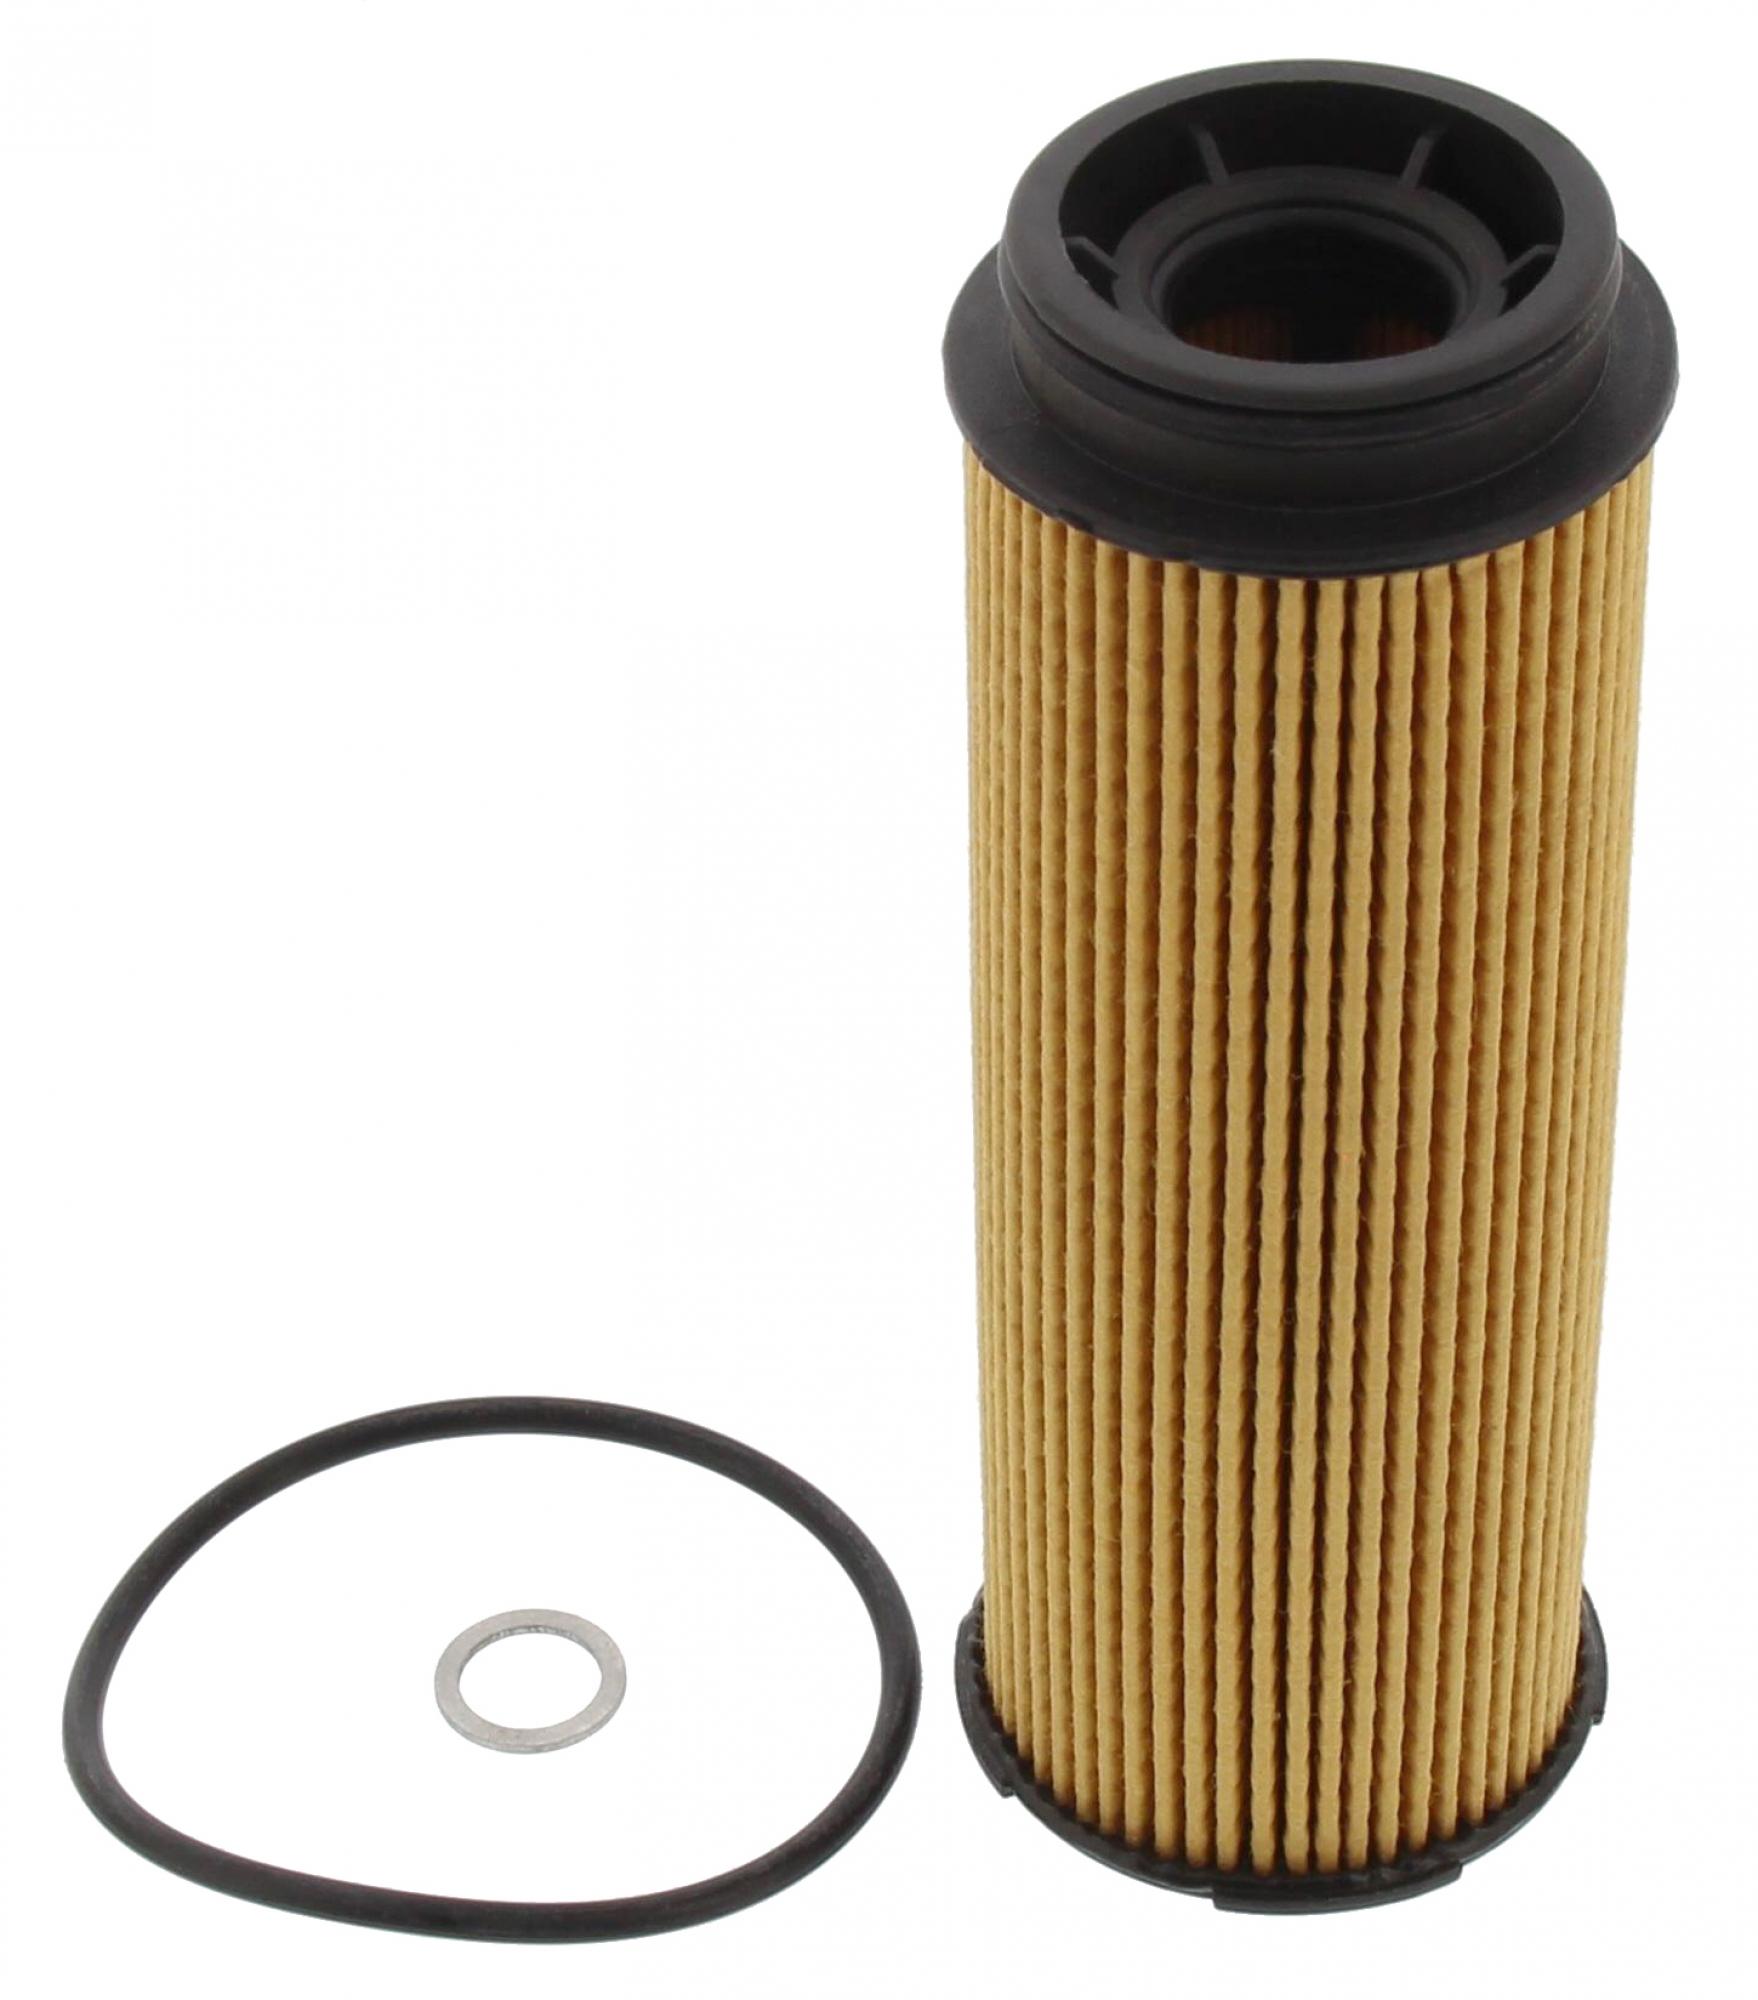 MAPCO 64610 Oil Filter